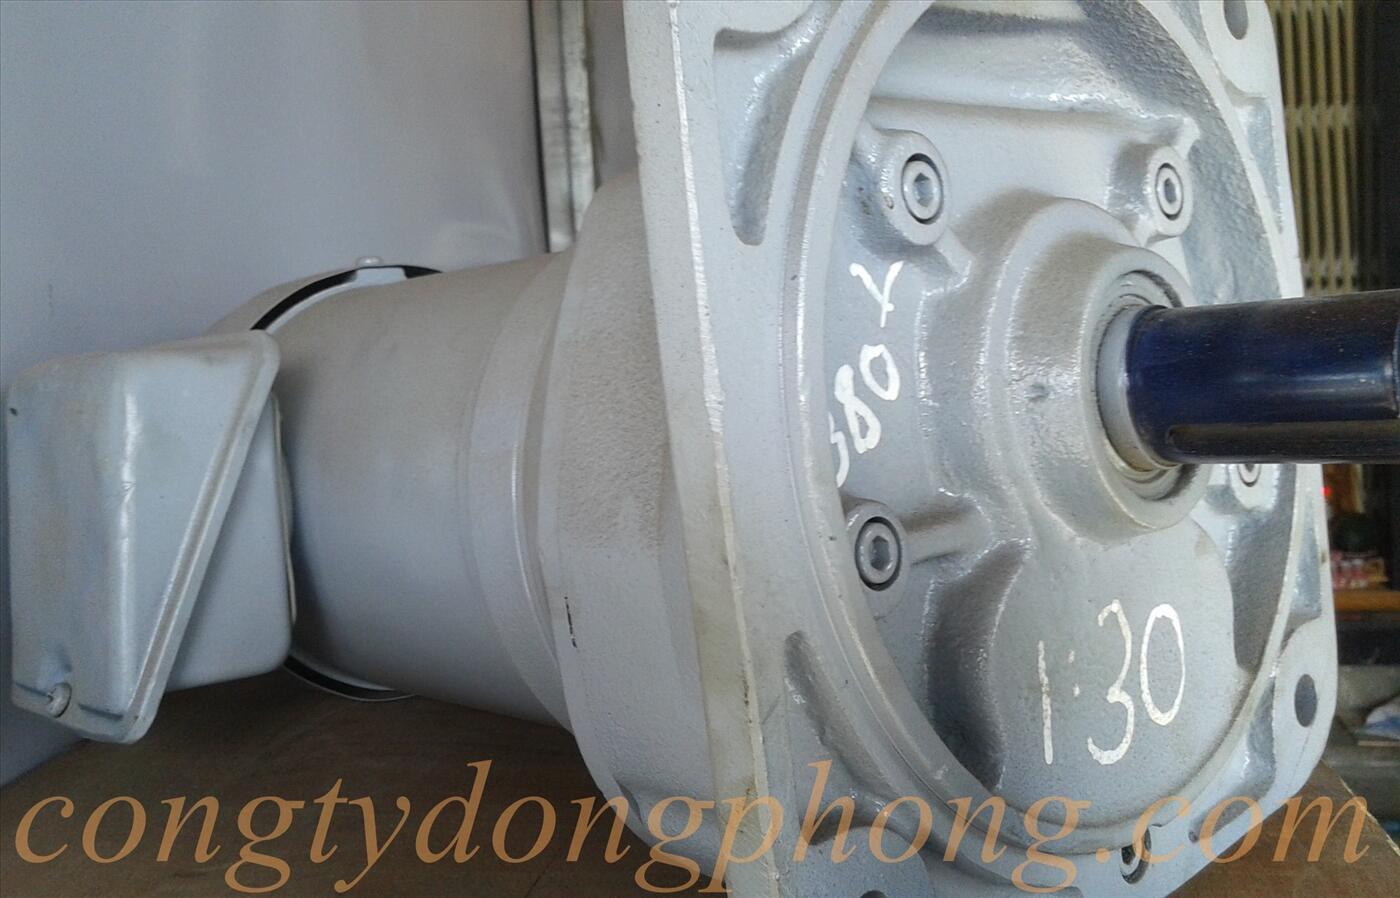 Motor giảm tốc 1/2hp 1/30 mặt bích